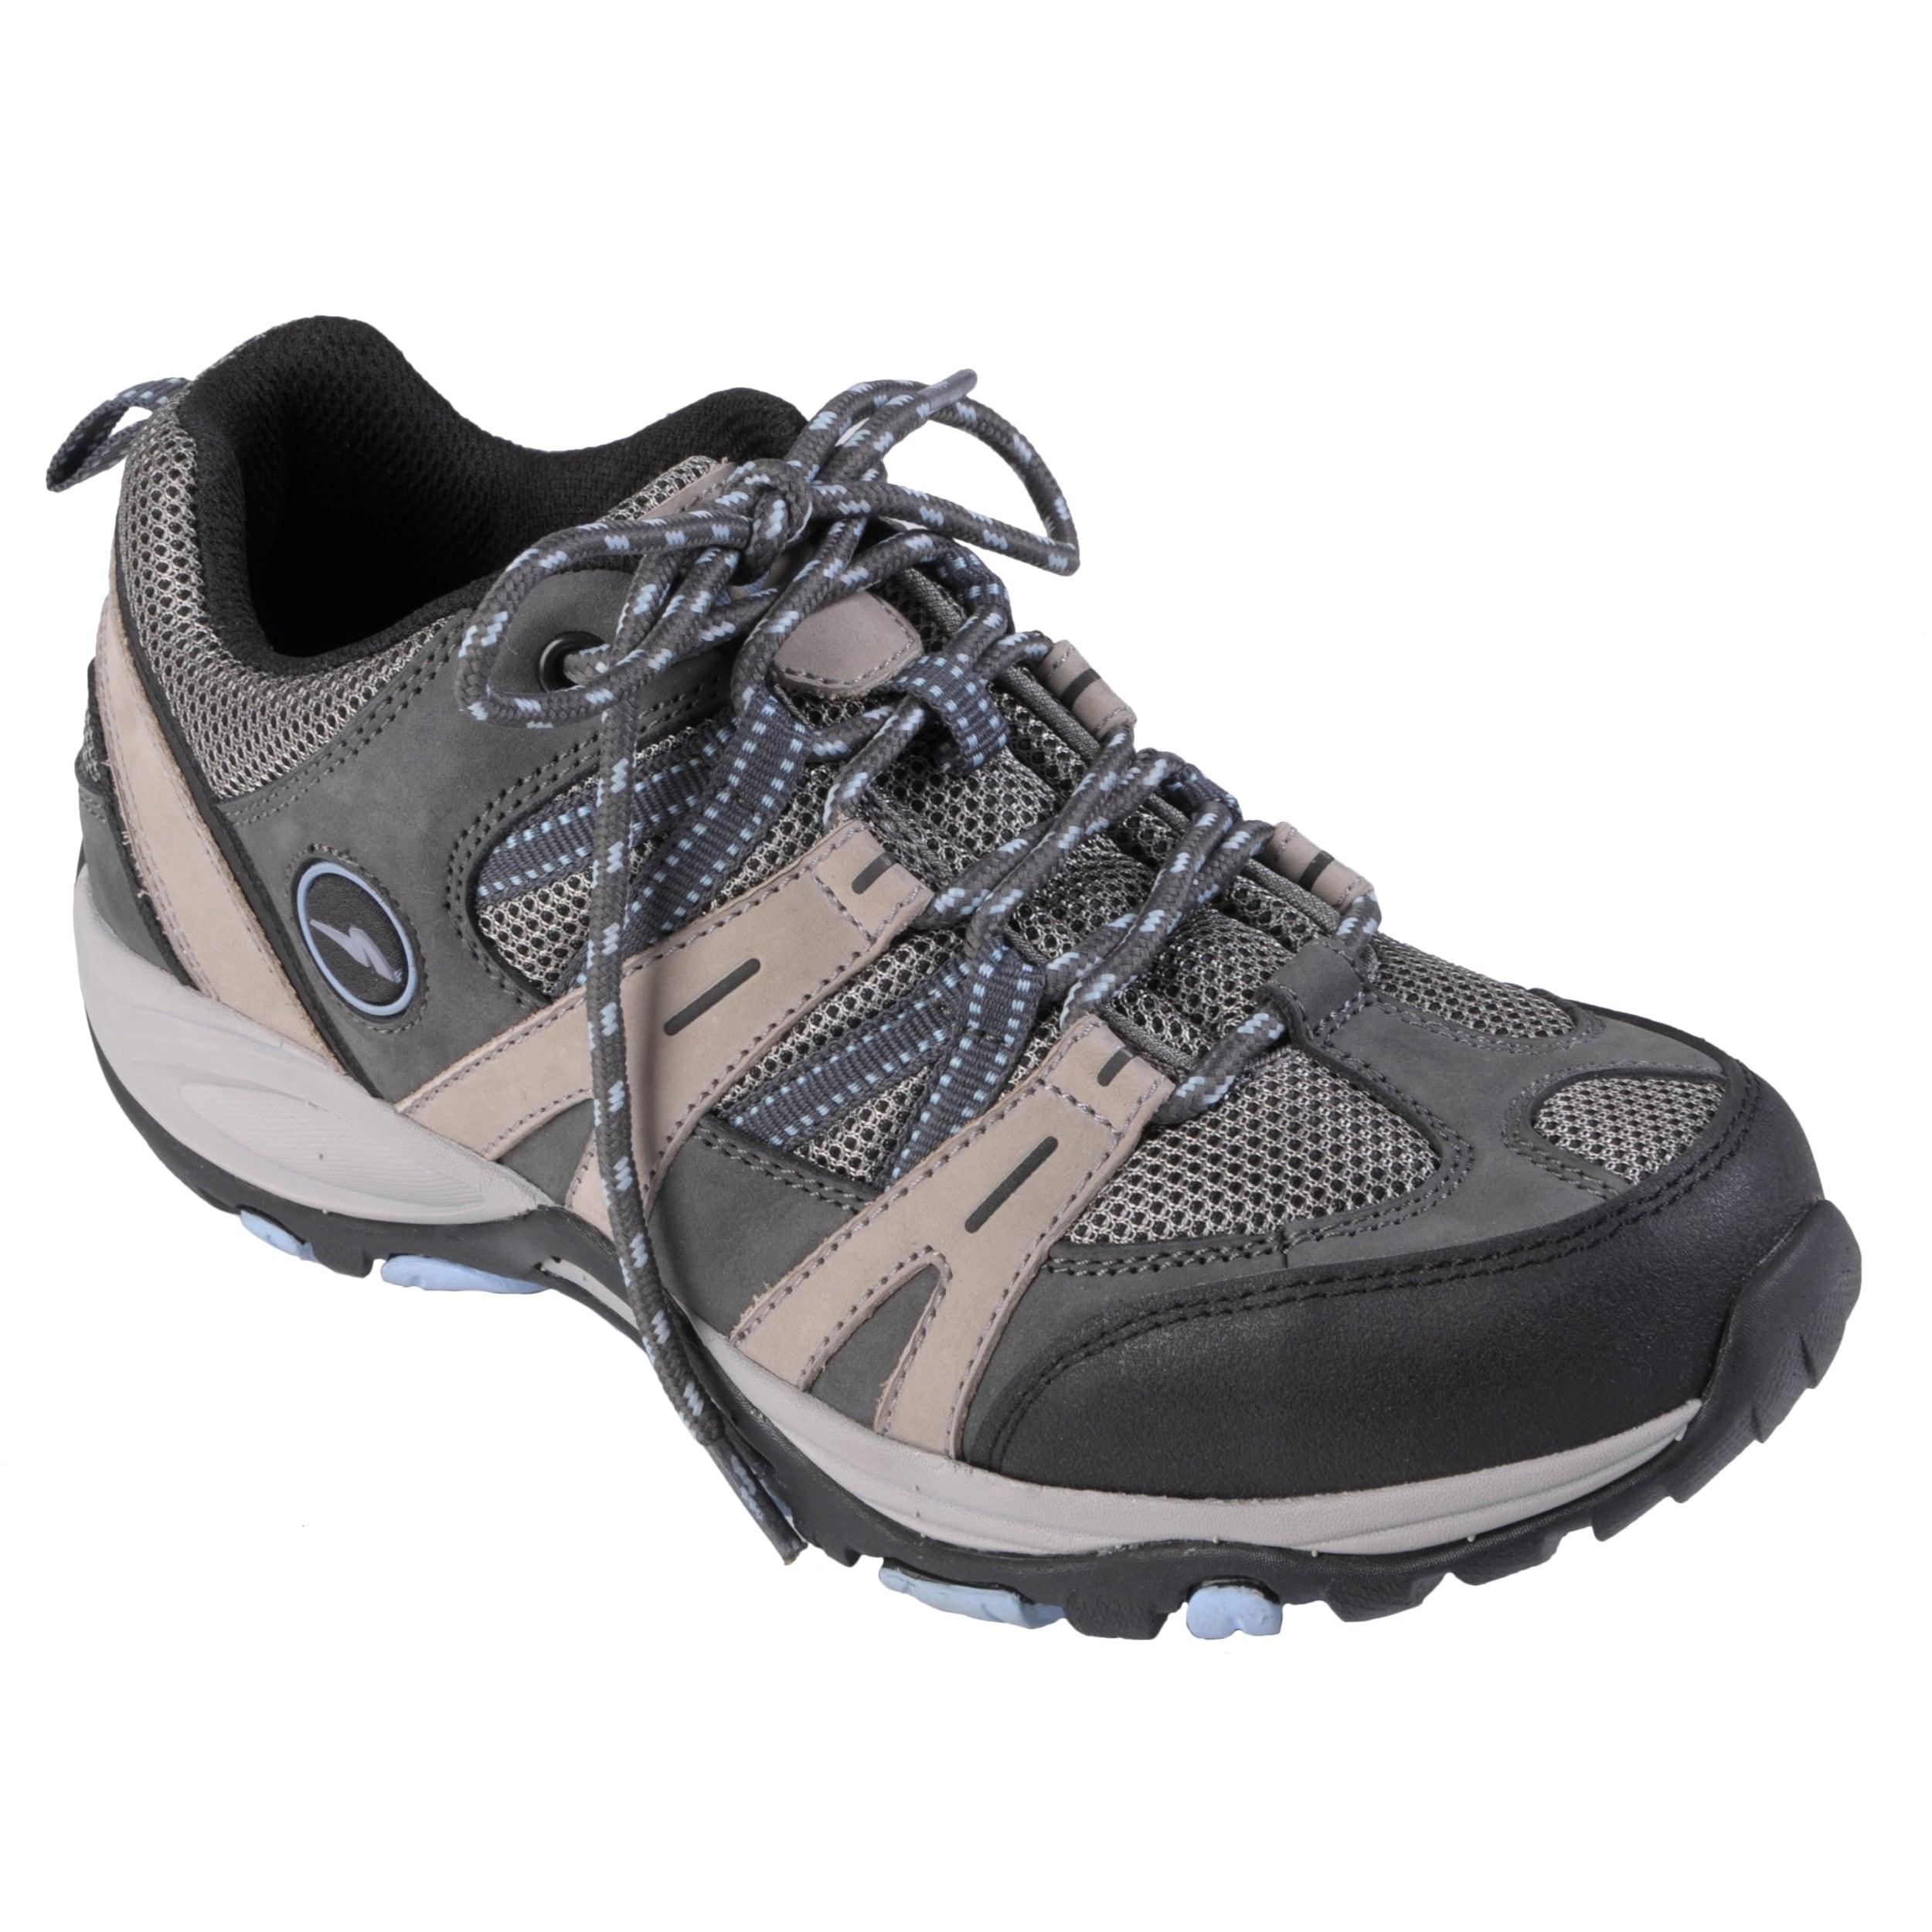 Slickrock Women's Lightweight Waterproof Lace-up Hiking Shoes